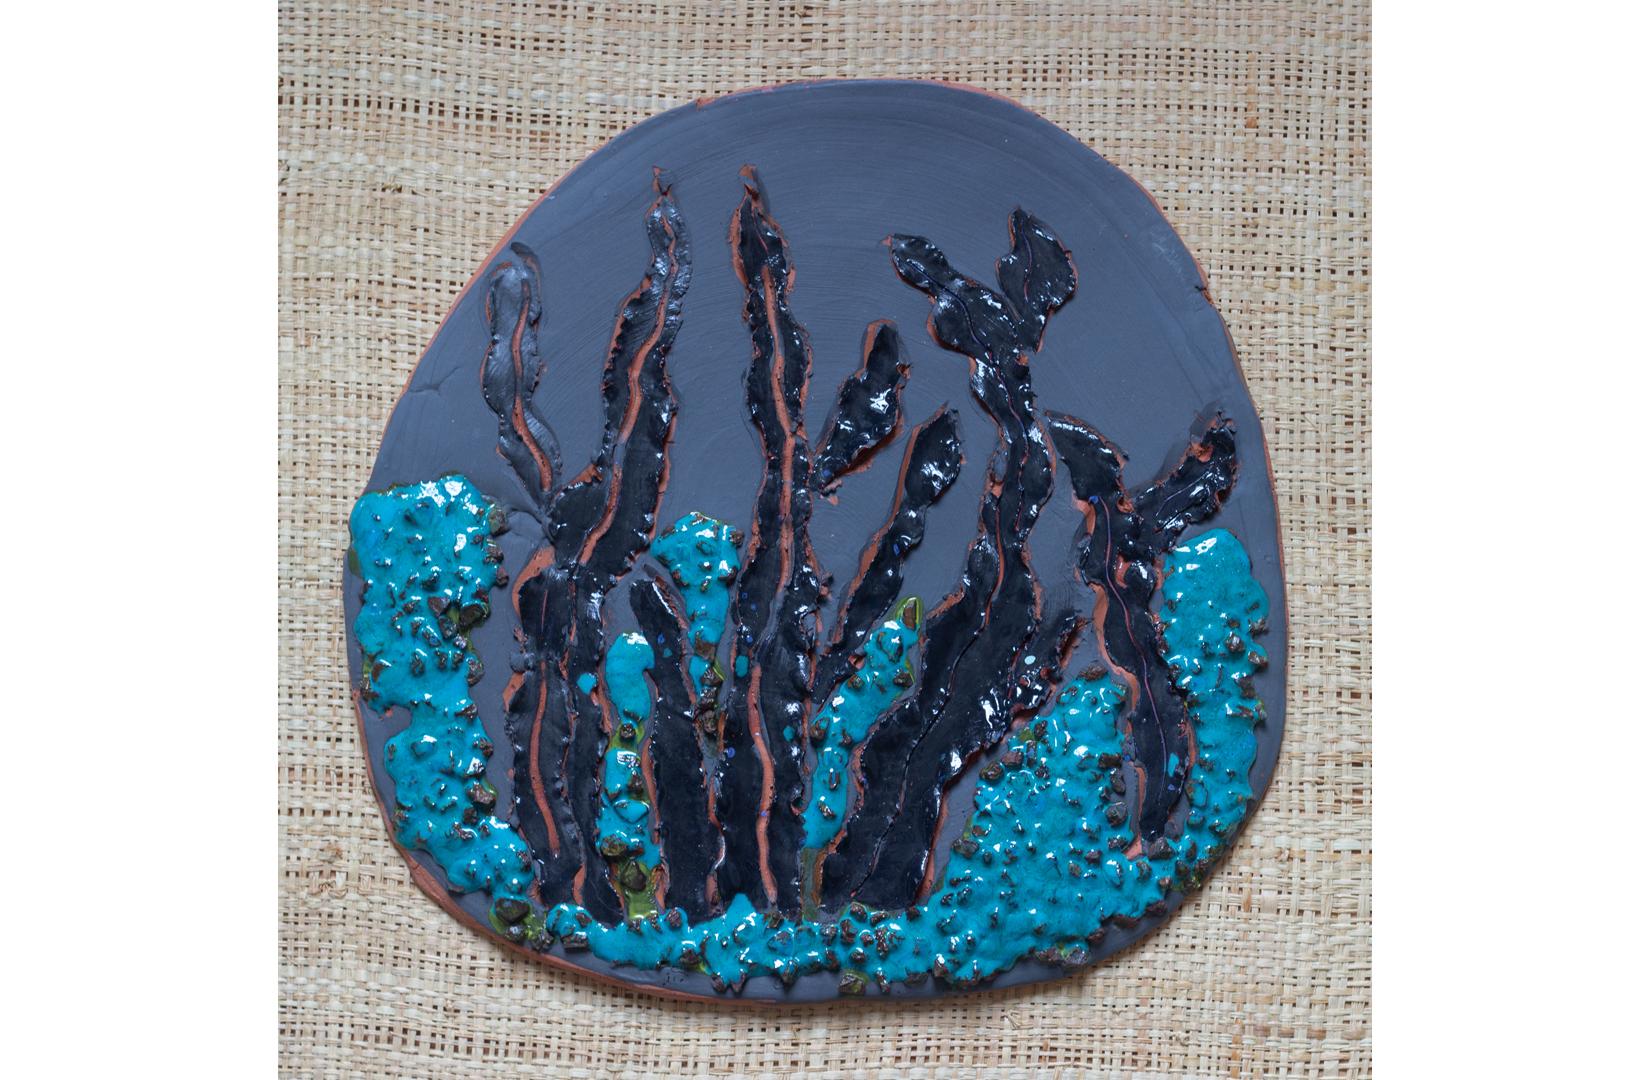 Ceramic, Clay, Glaze, Plate, Peridot